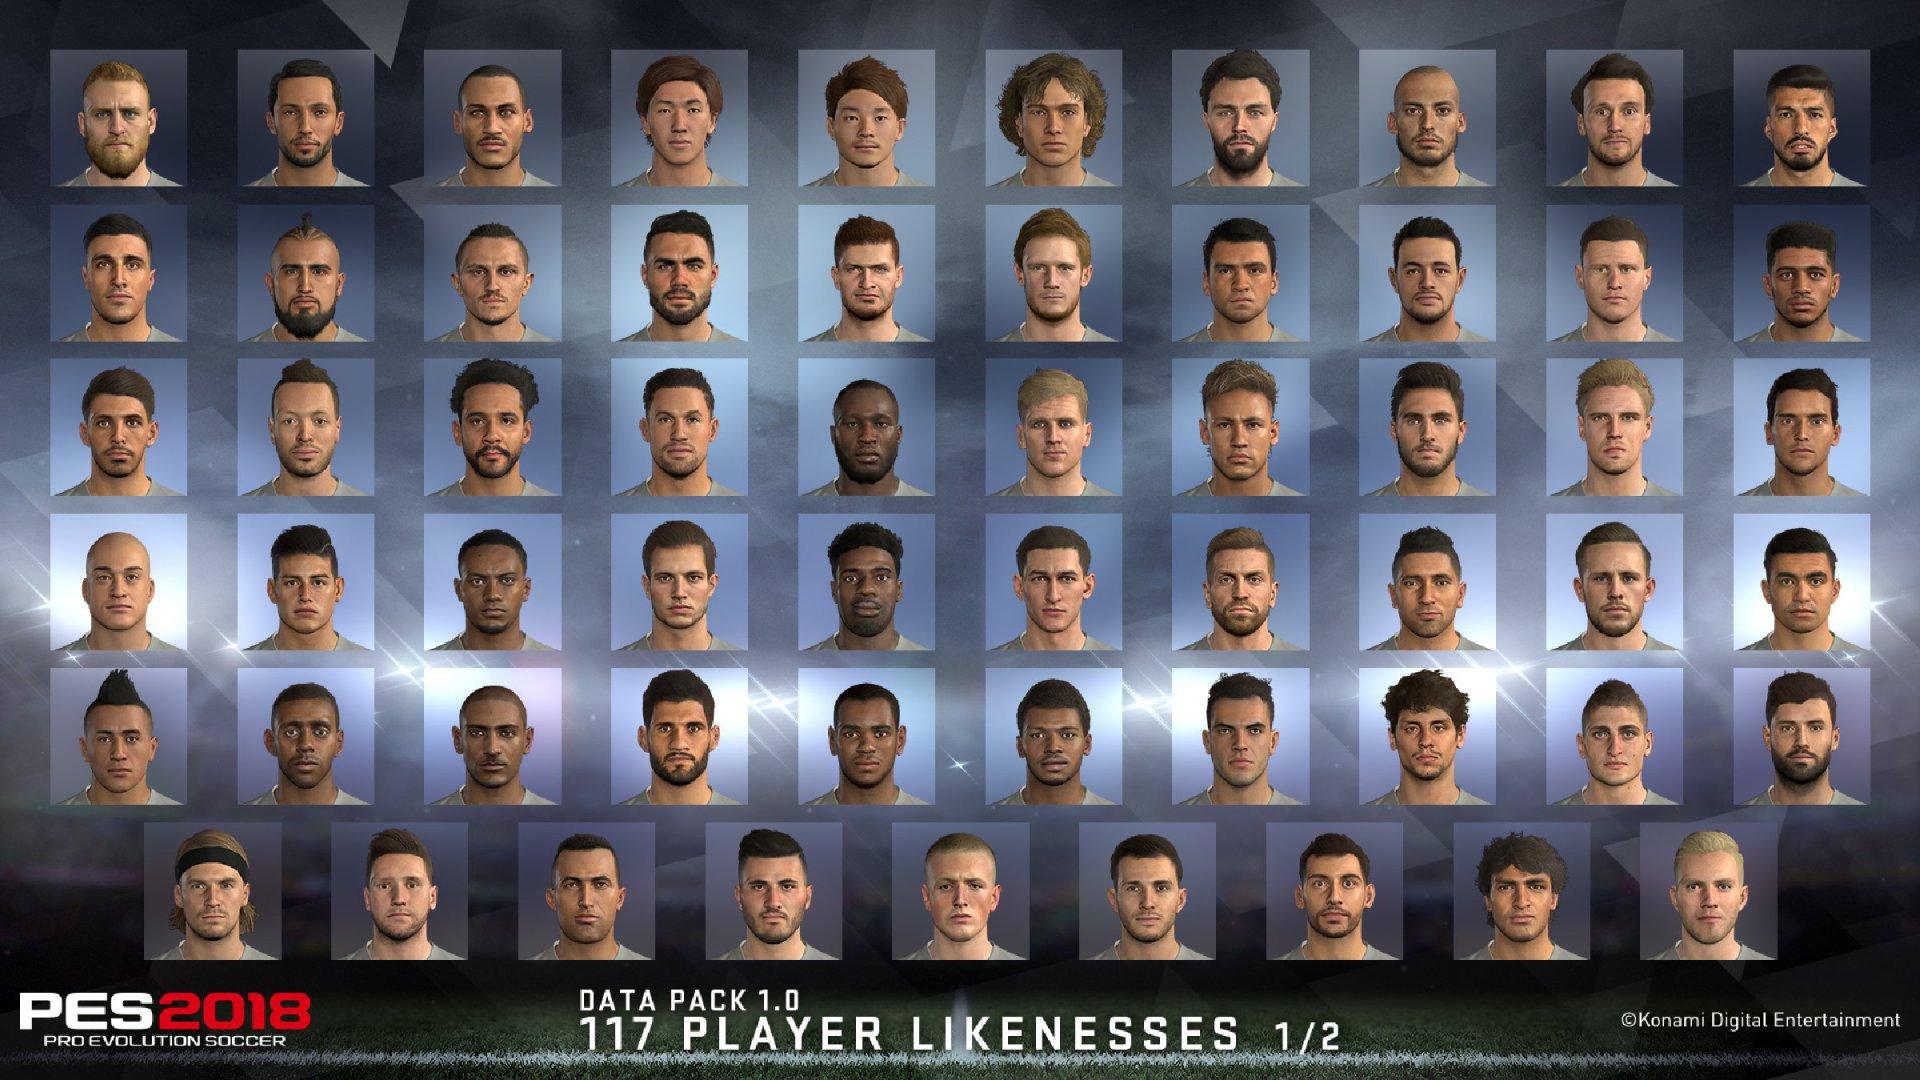 Pro Evolution Soccer 2018 Erstes Pes Data Pack Erhltlich Sony Ps4 Premium Edition Screenshot 360